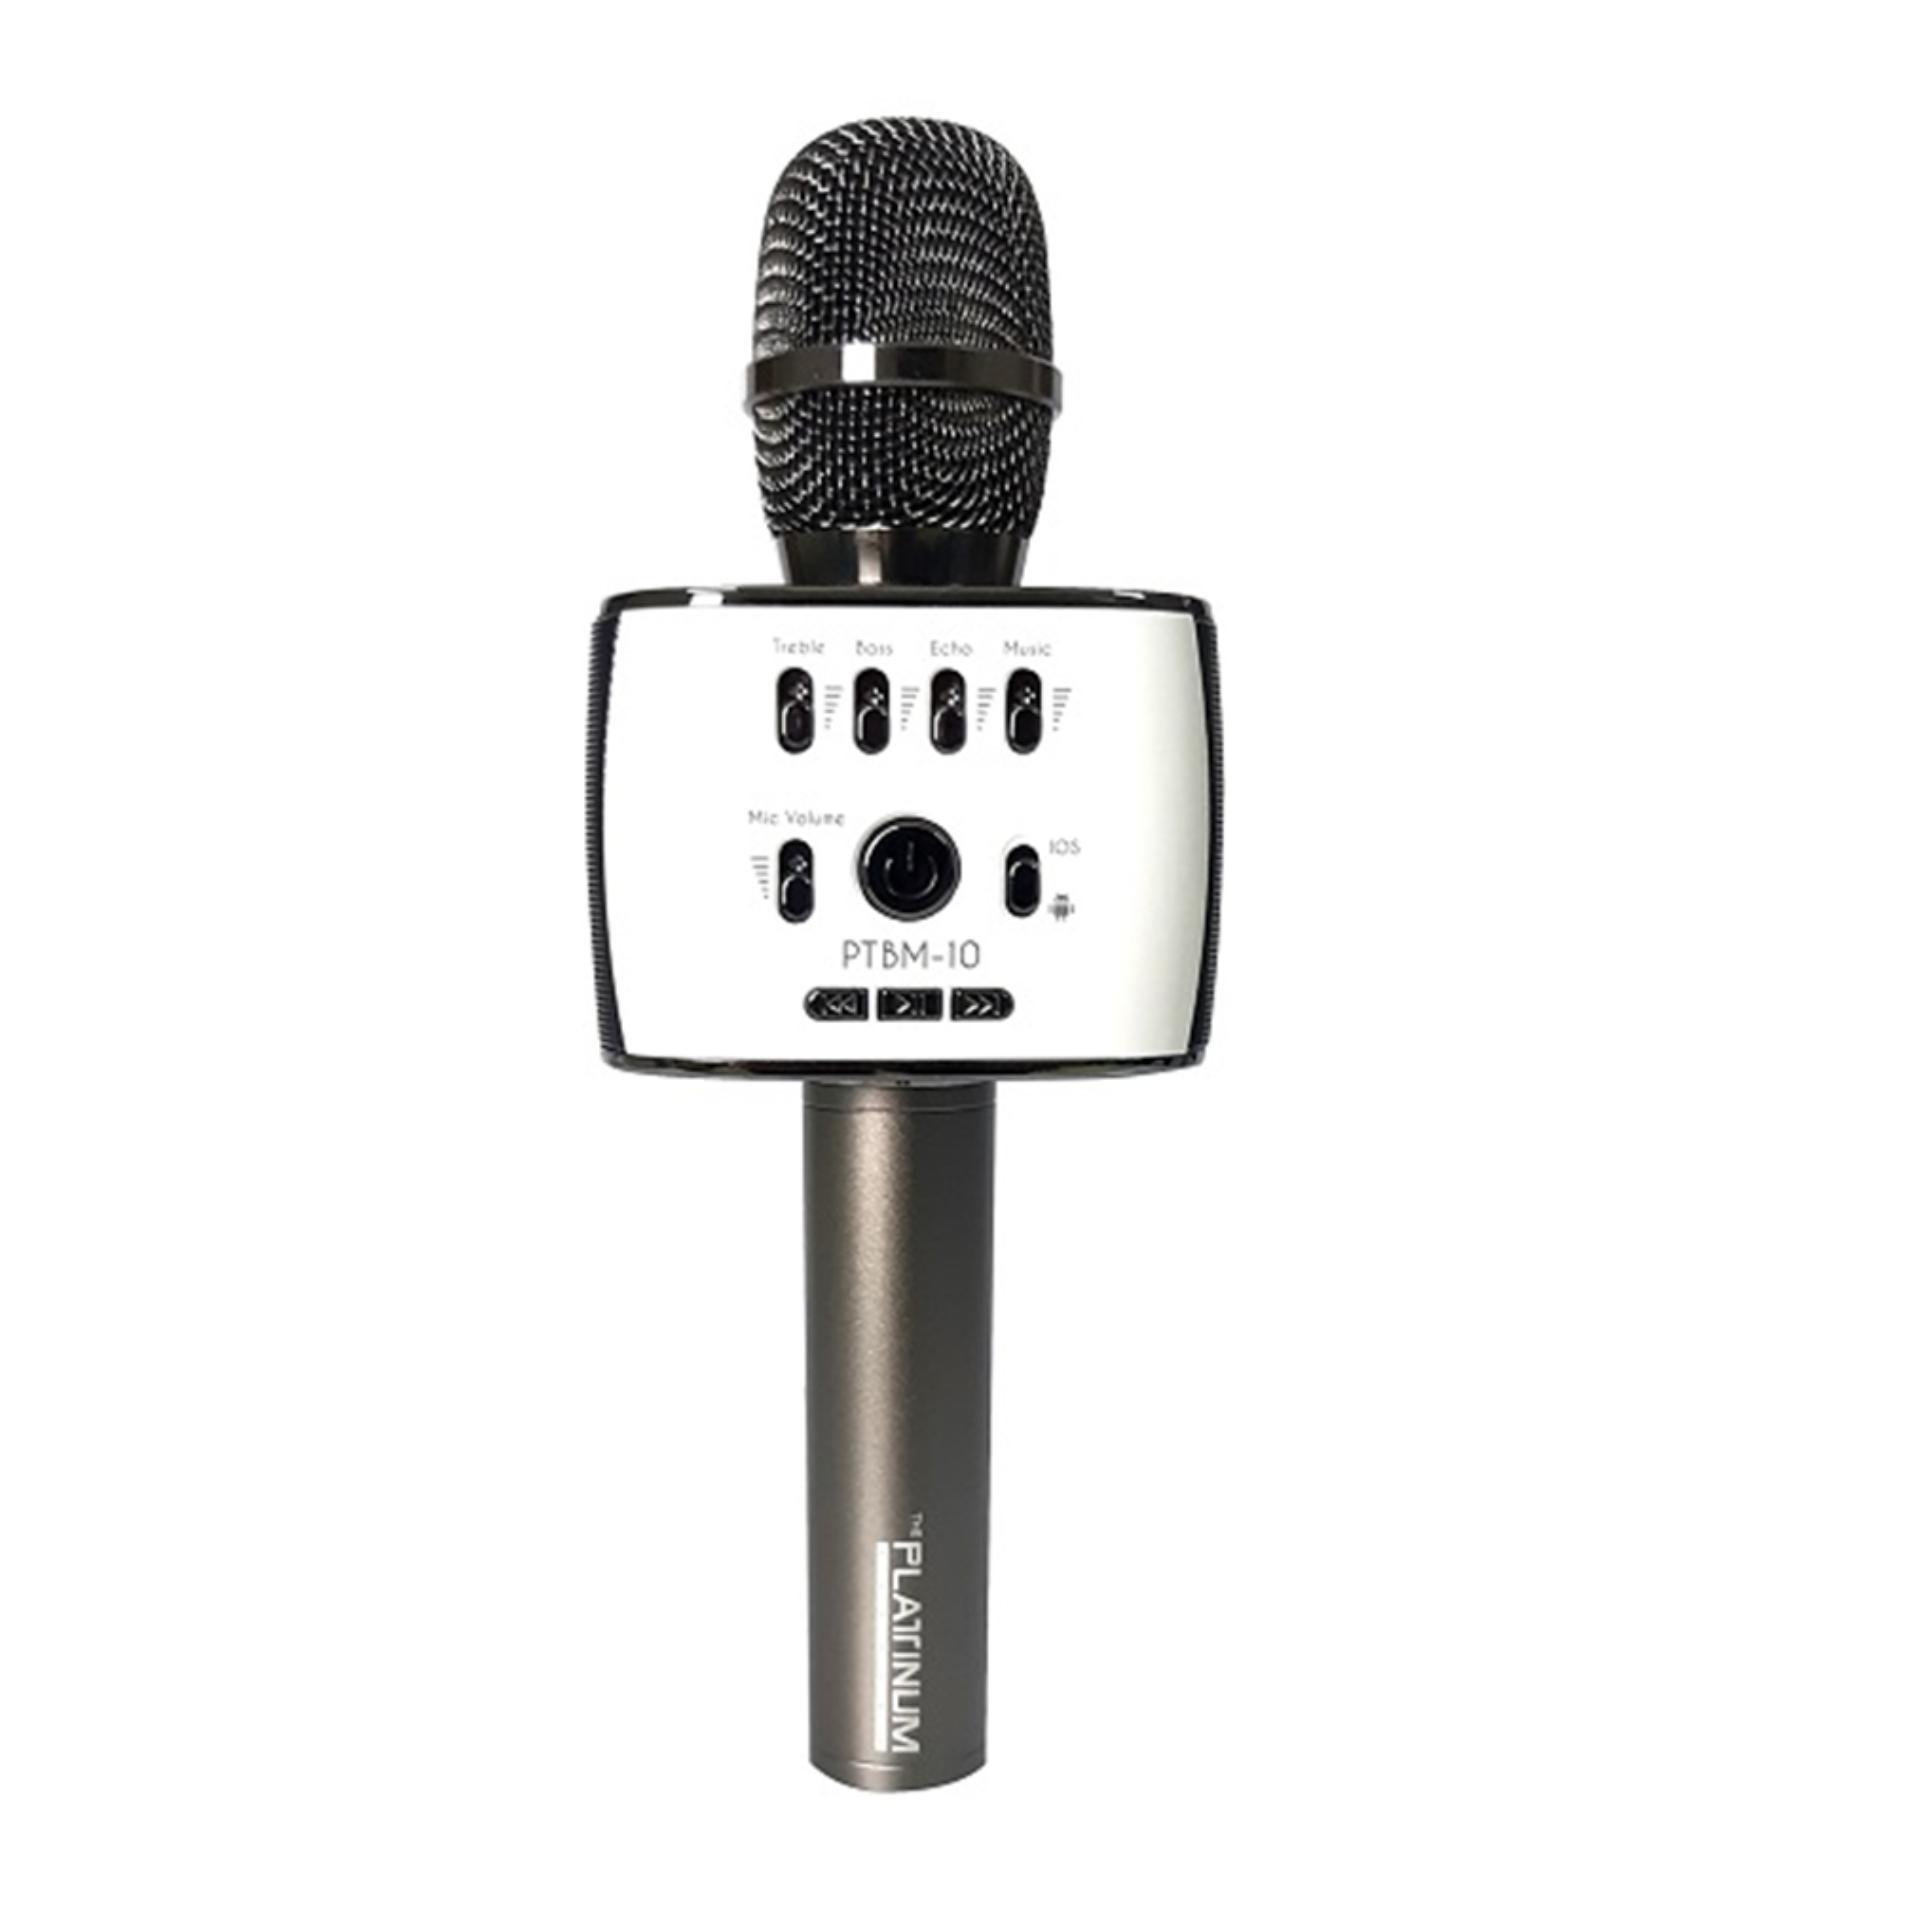 The Platinum PTBM 10 Bluetooth Microphone Gray